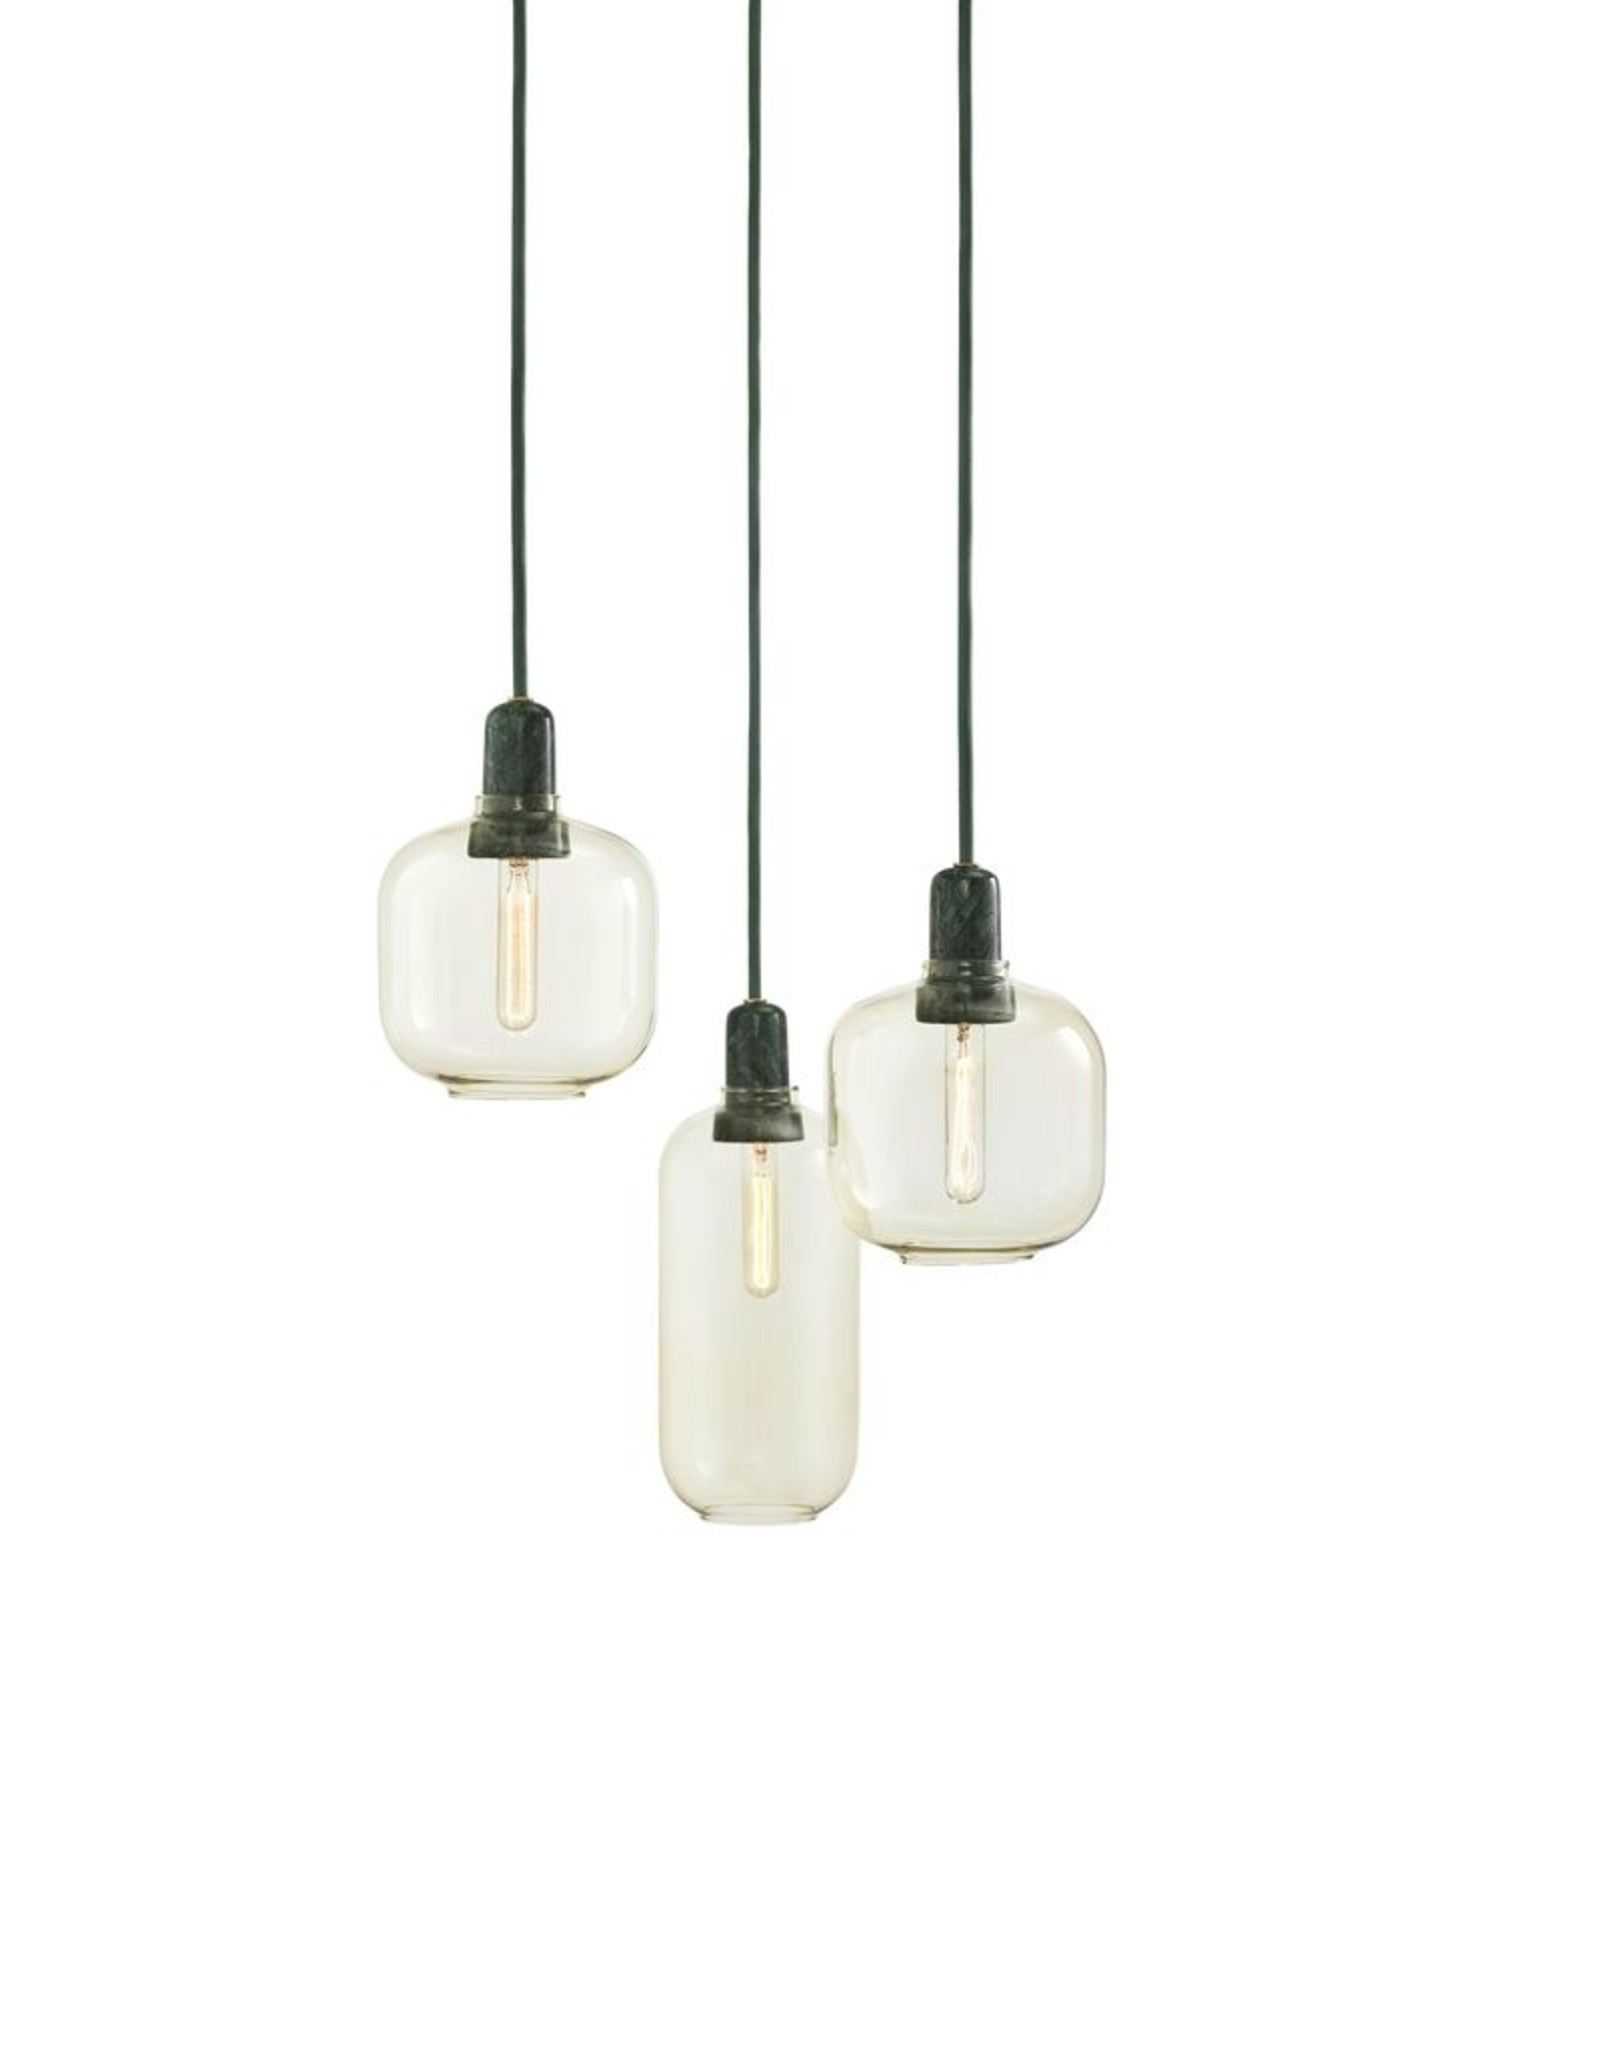 Normann Copenhagen Amp Lamp S Groen